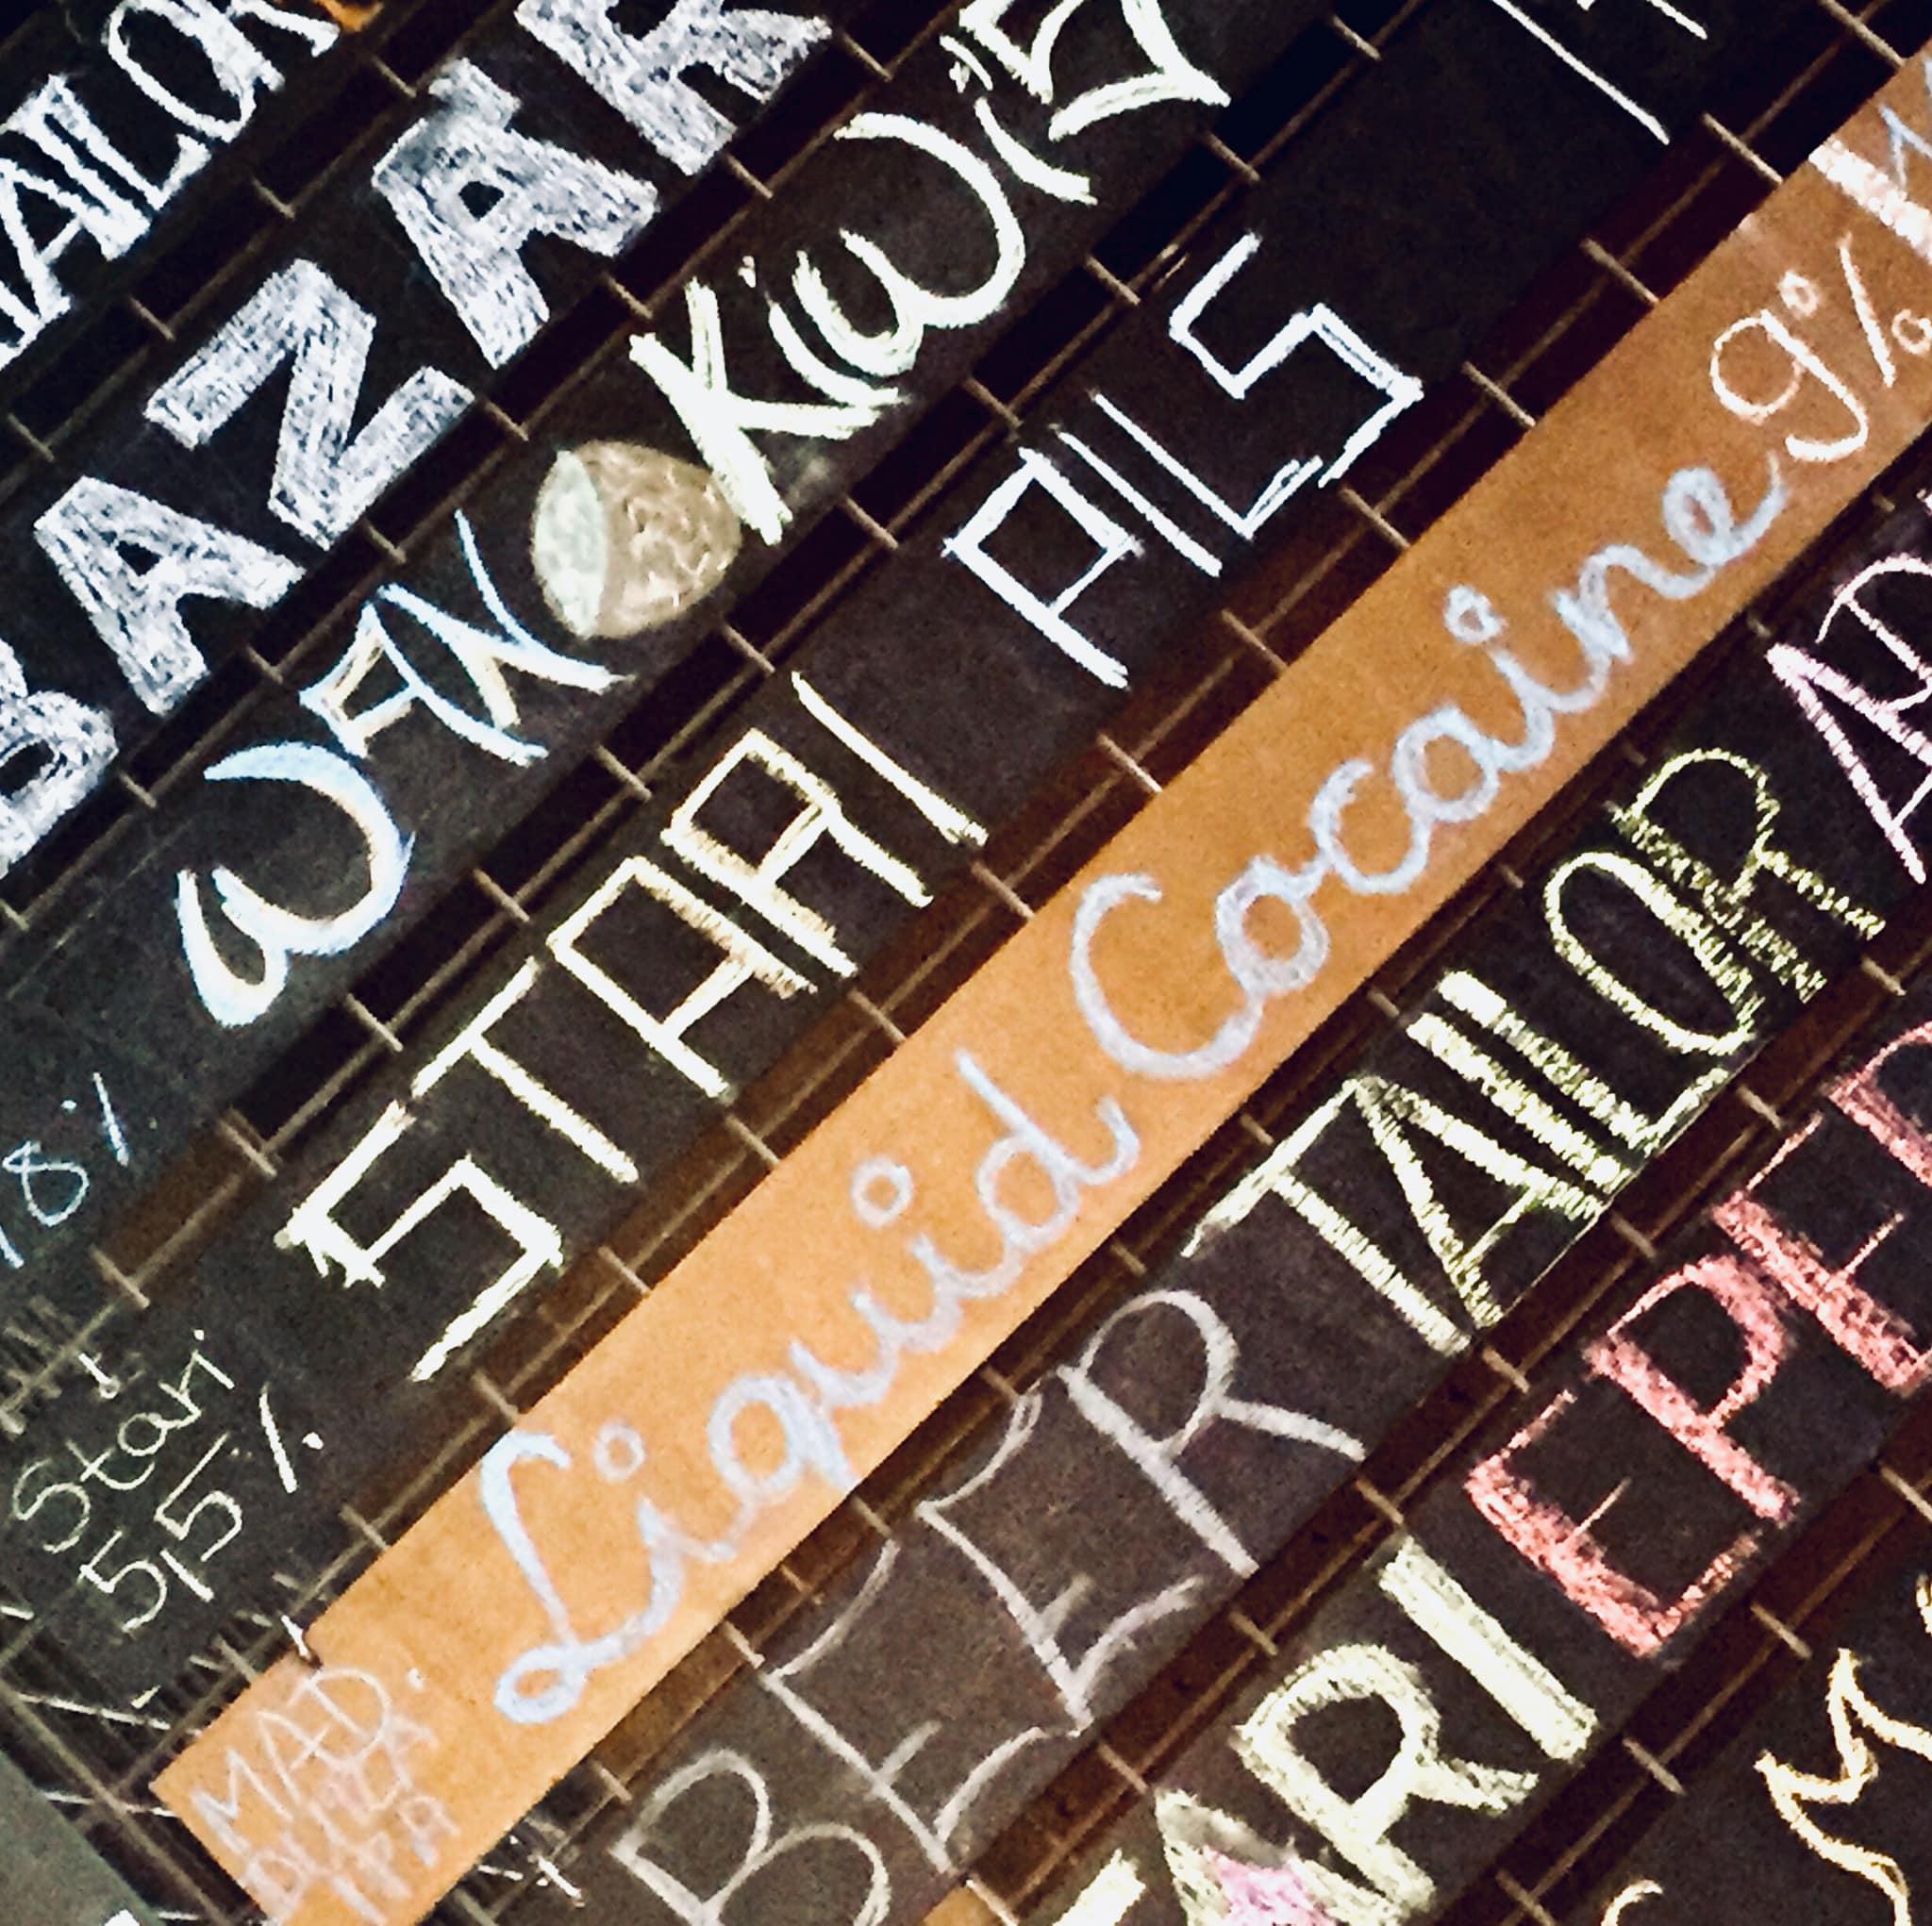 Kézműves sörök - Craft Beers